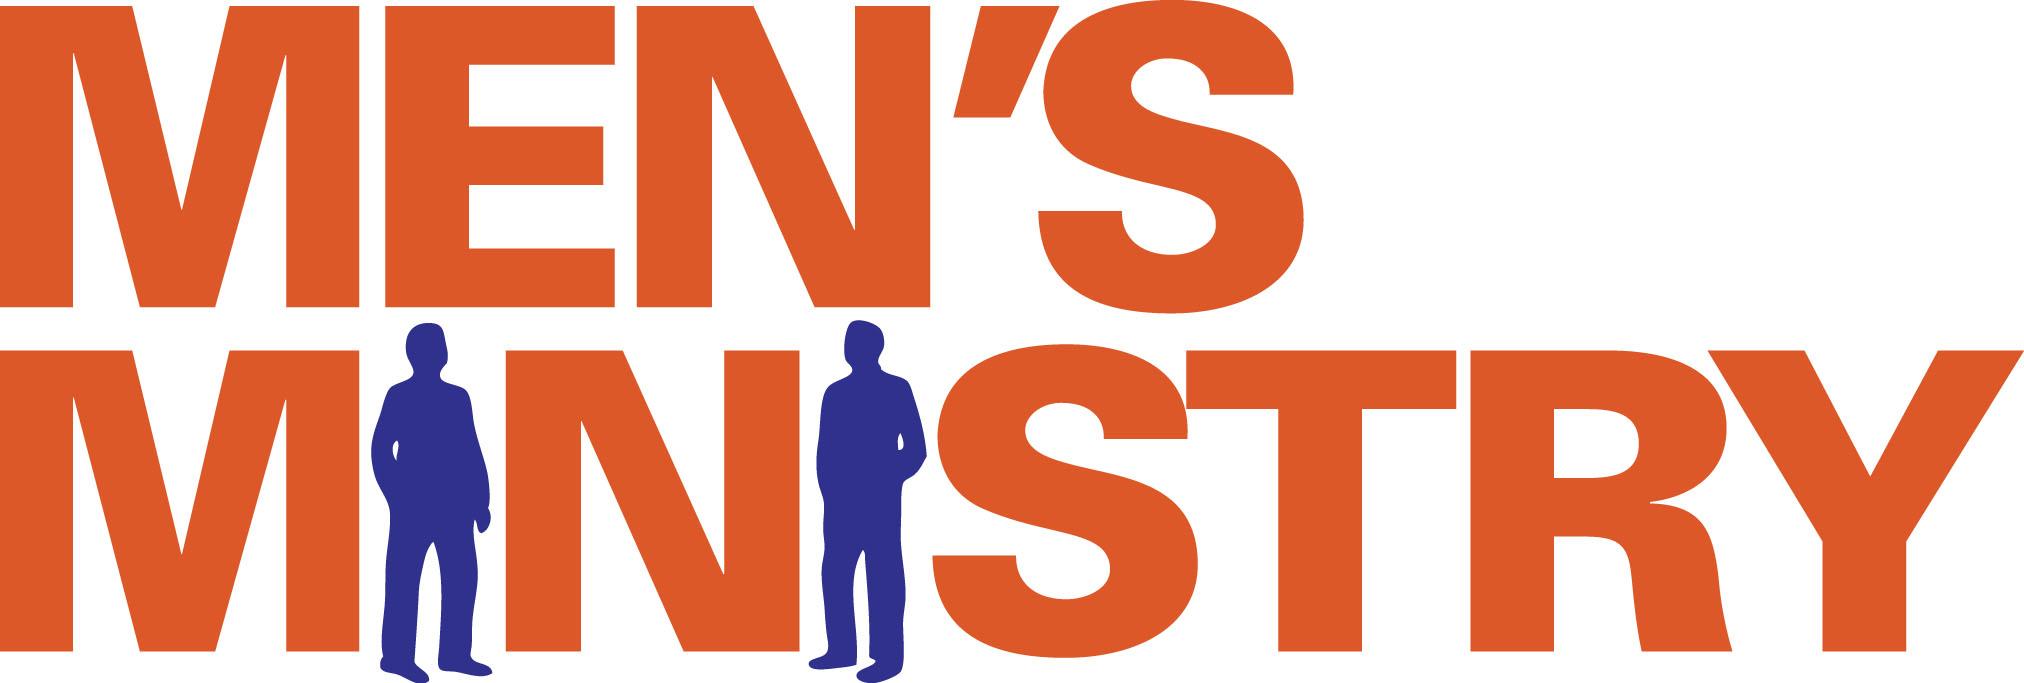 Men's Ministry Clip Art